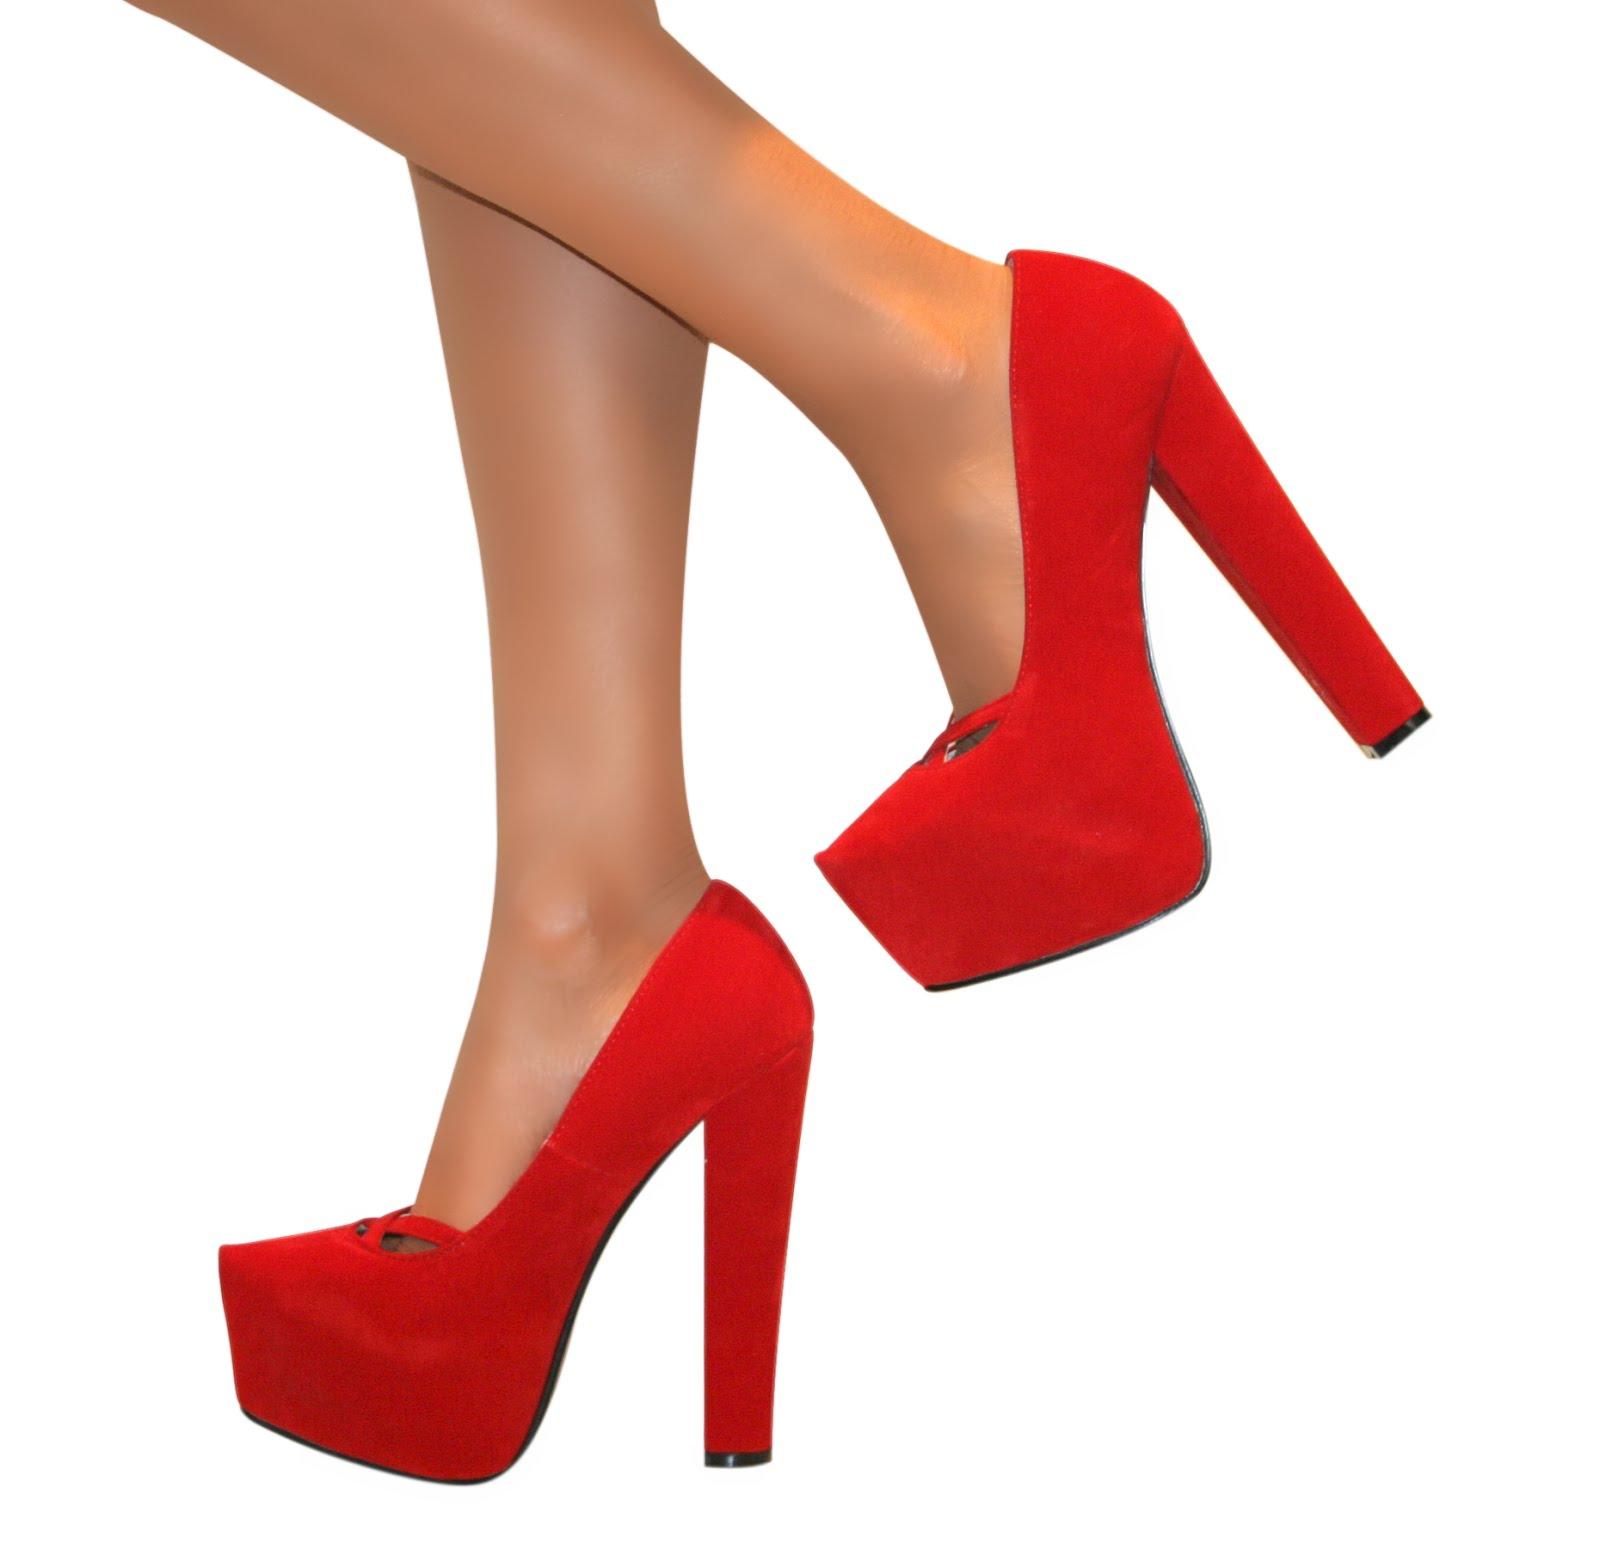 WOMENS-SUEDE-HIGH-BLOCK-HEELS-COURT-SHOE-CONCEALED-PLATFORM-STILETTO-PUMPS-SIZE